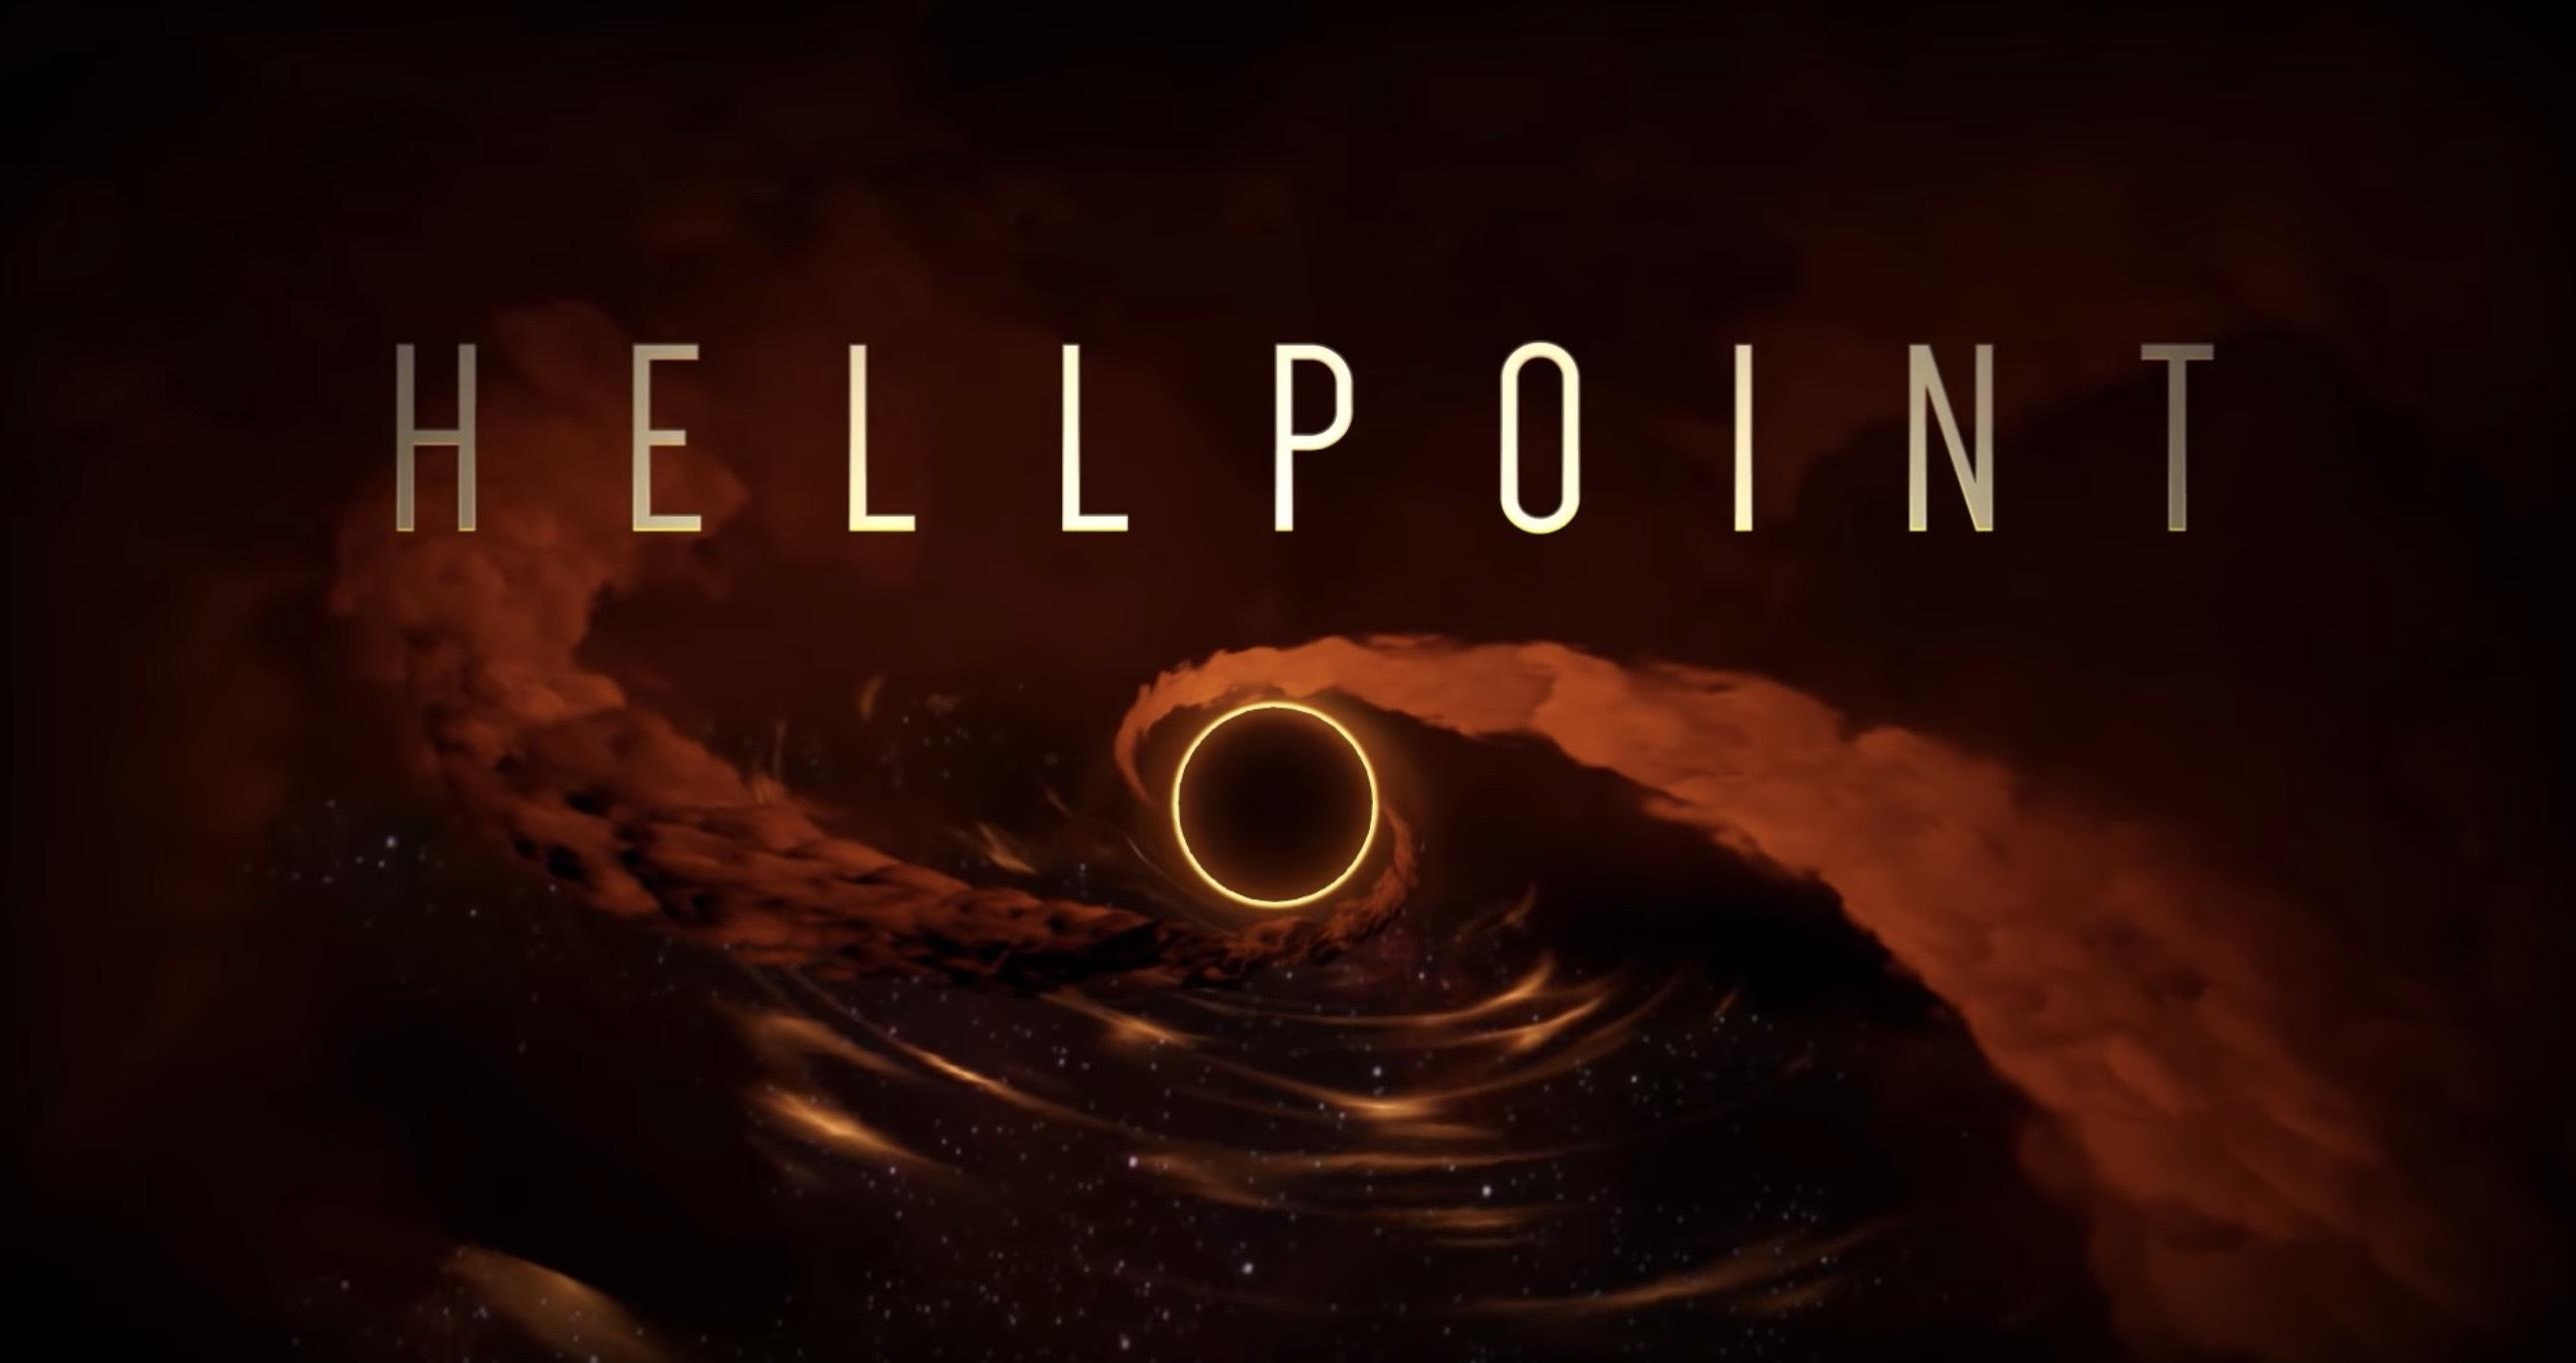 hellpoint portada